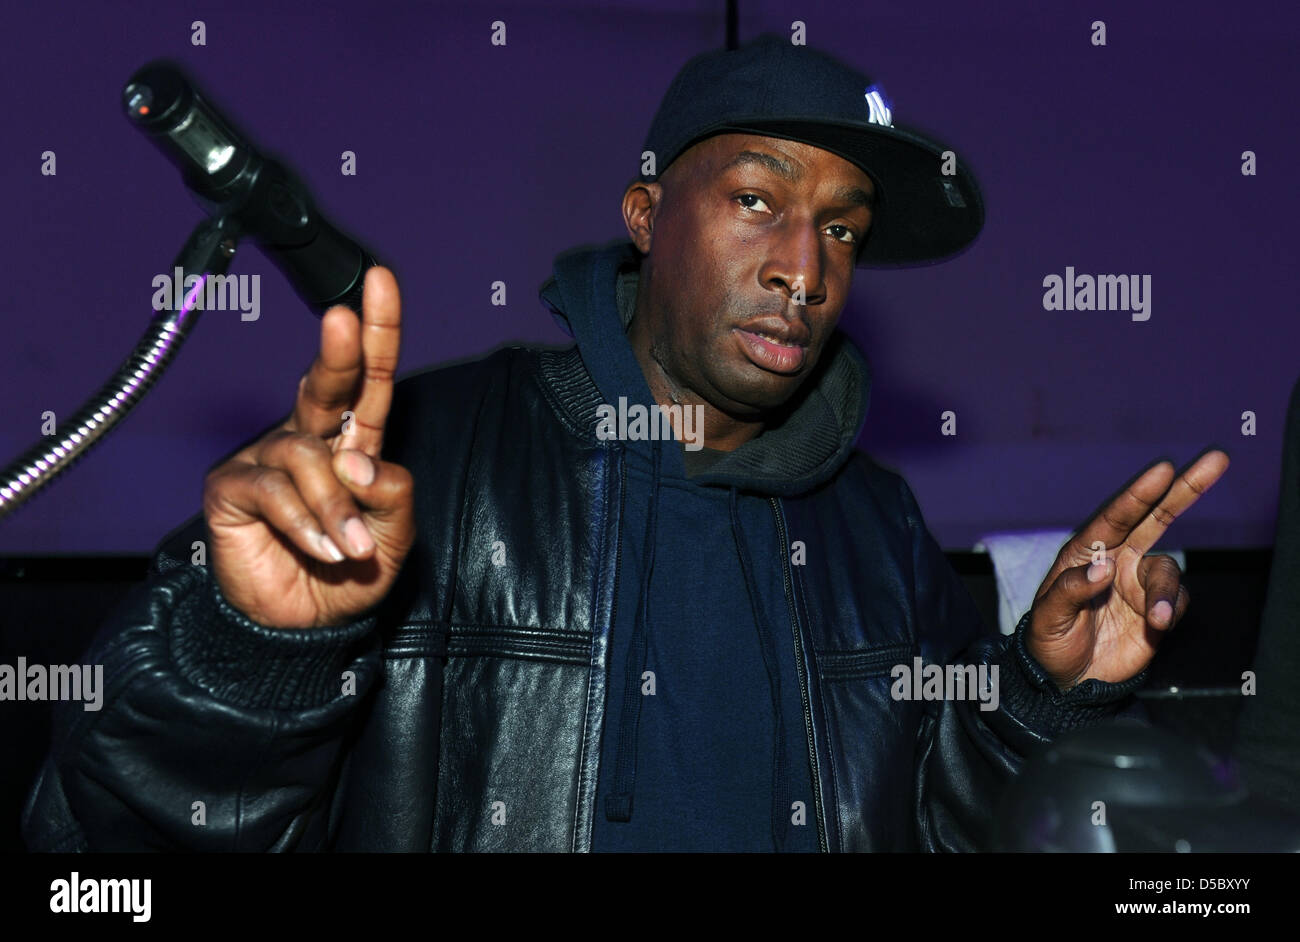 U.S. American DJ Grandmaster Flash alias Joseph Saddler poses during the soundcheck at the noble nightclub 'P1' - Stock Image